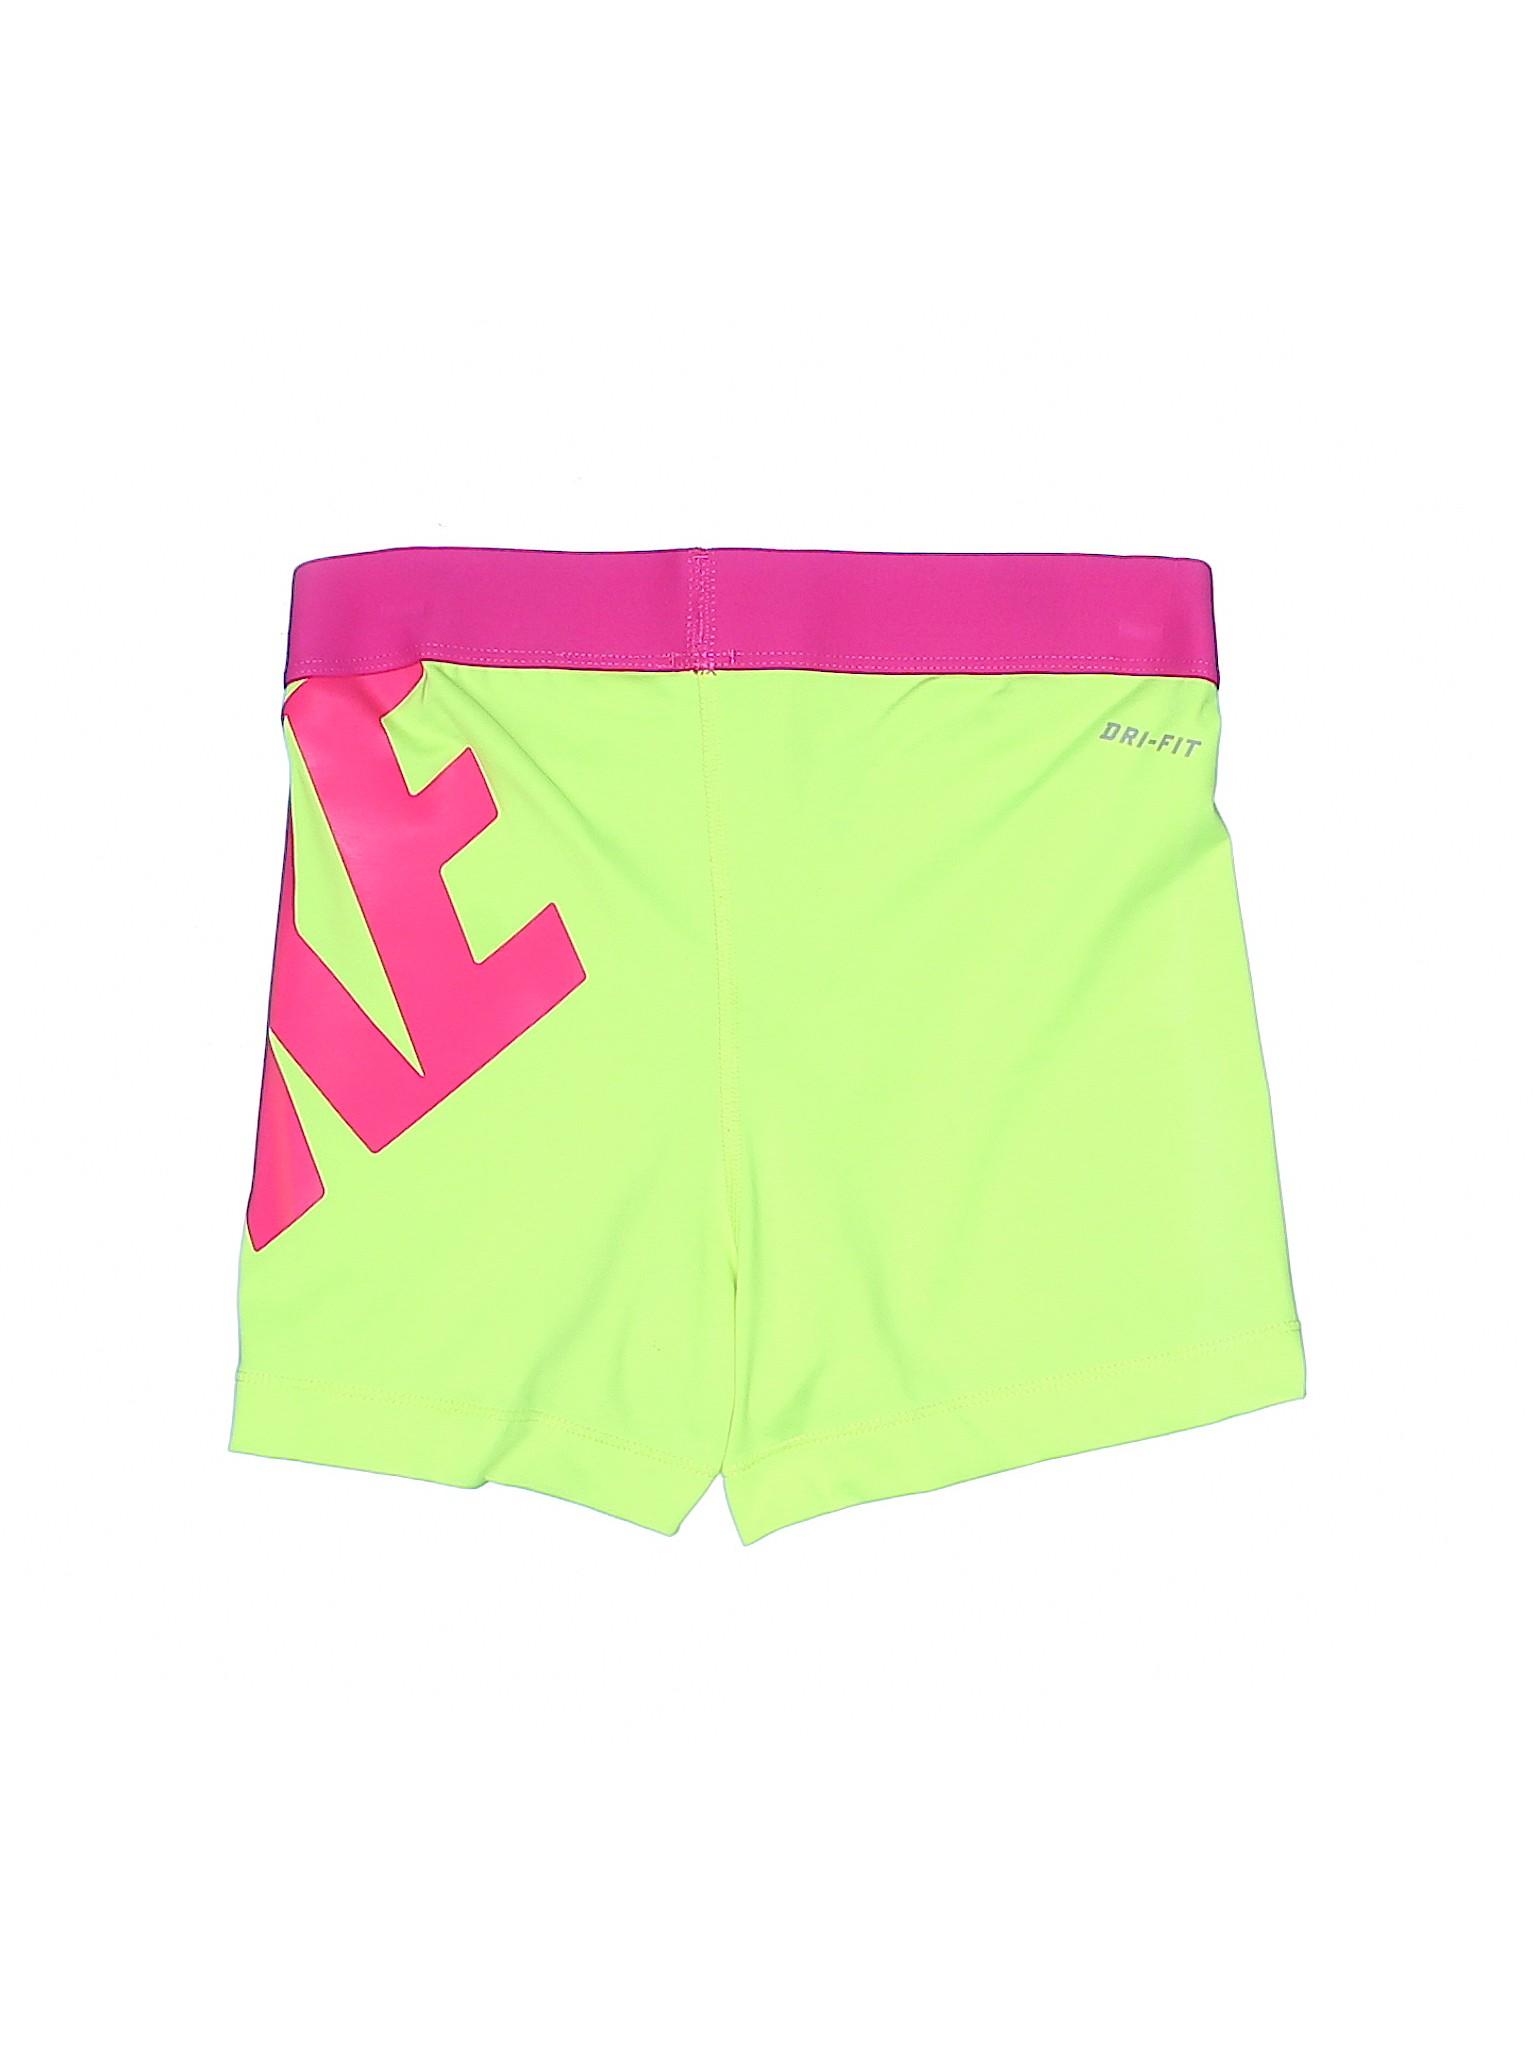 Leisure Nike Leisure winter Nike Leisure Athletic Shorts winter Shorts Athletic winter qpPHW4tB